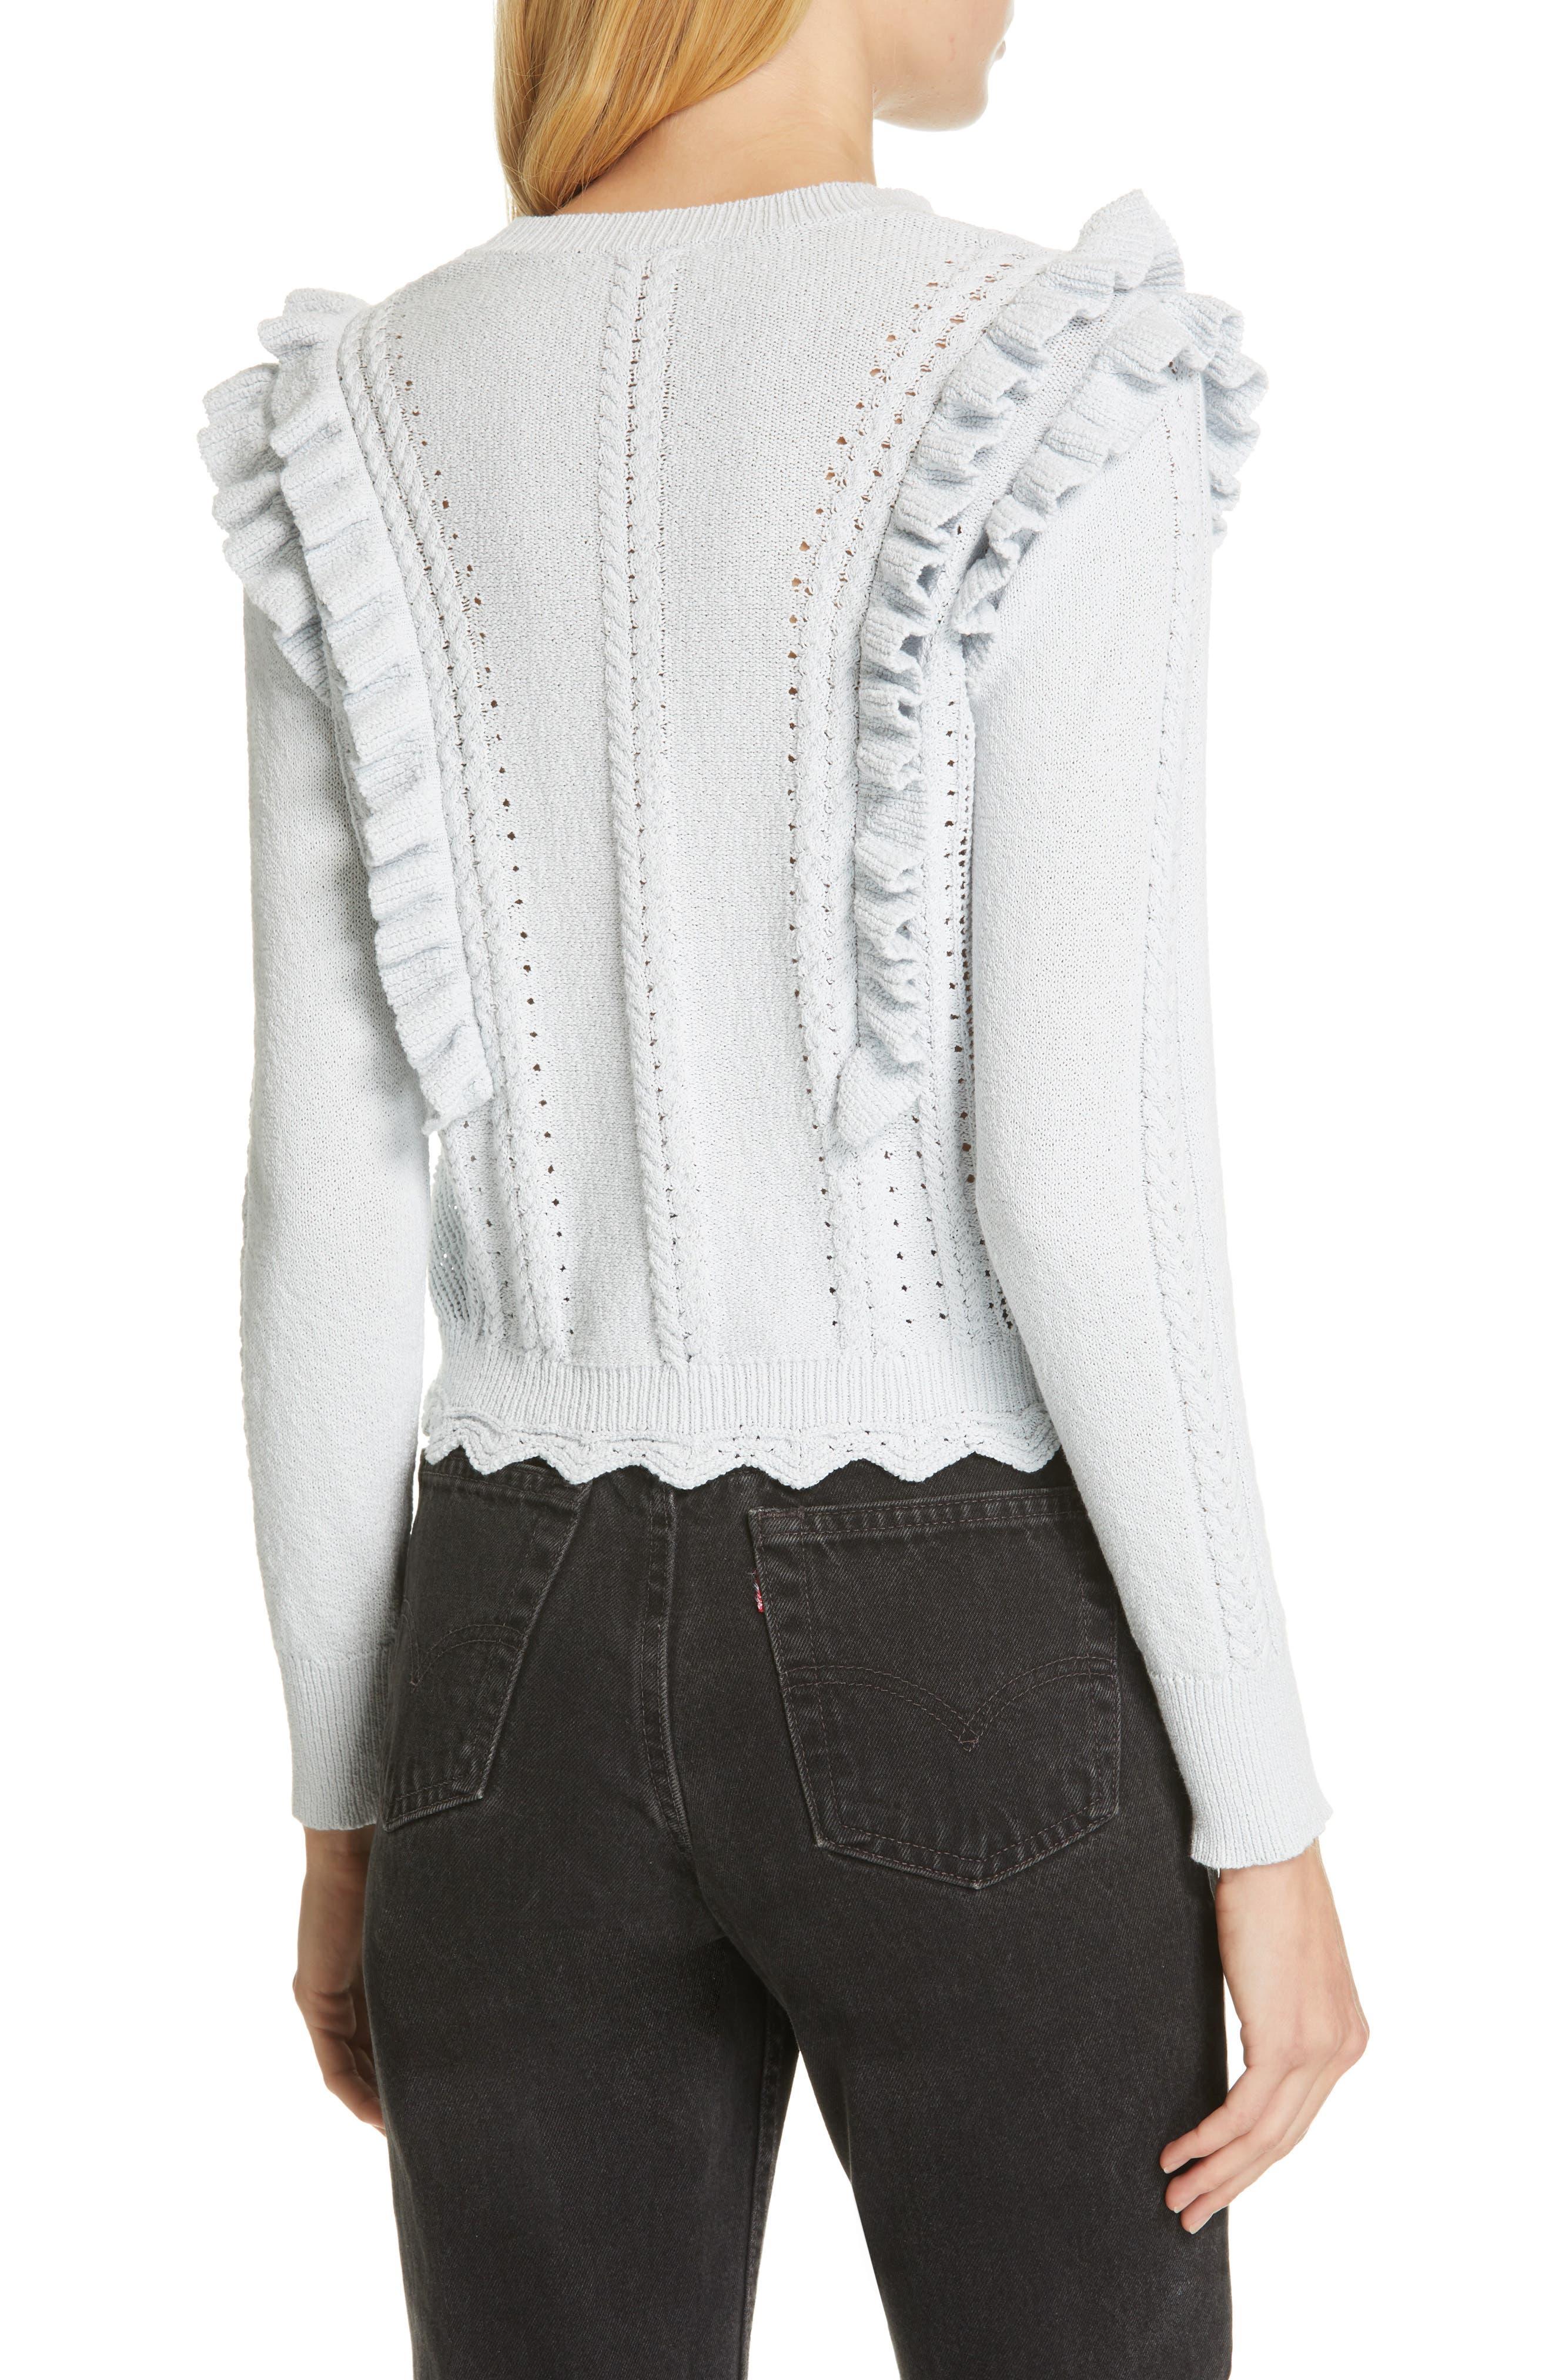 REBECCA TAYLOR, Ruffled Sweater, Alternate thumbnail 2, color, LIGHT MINT